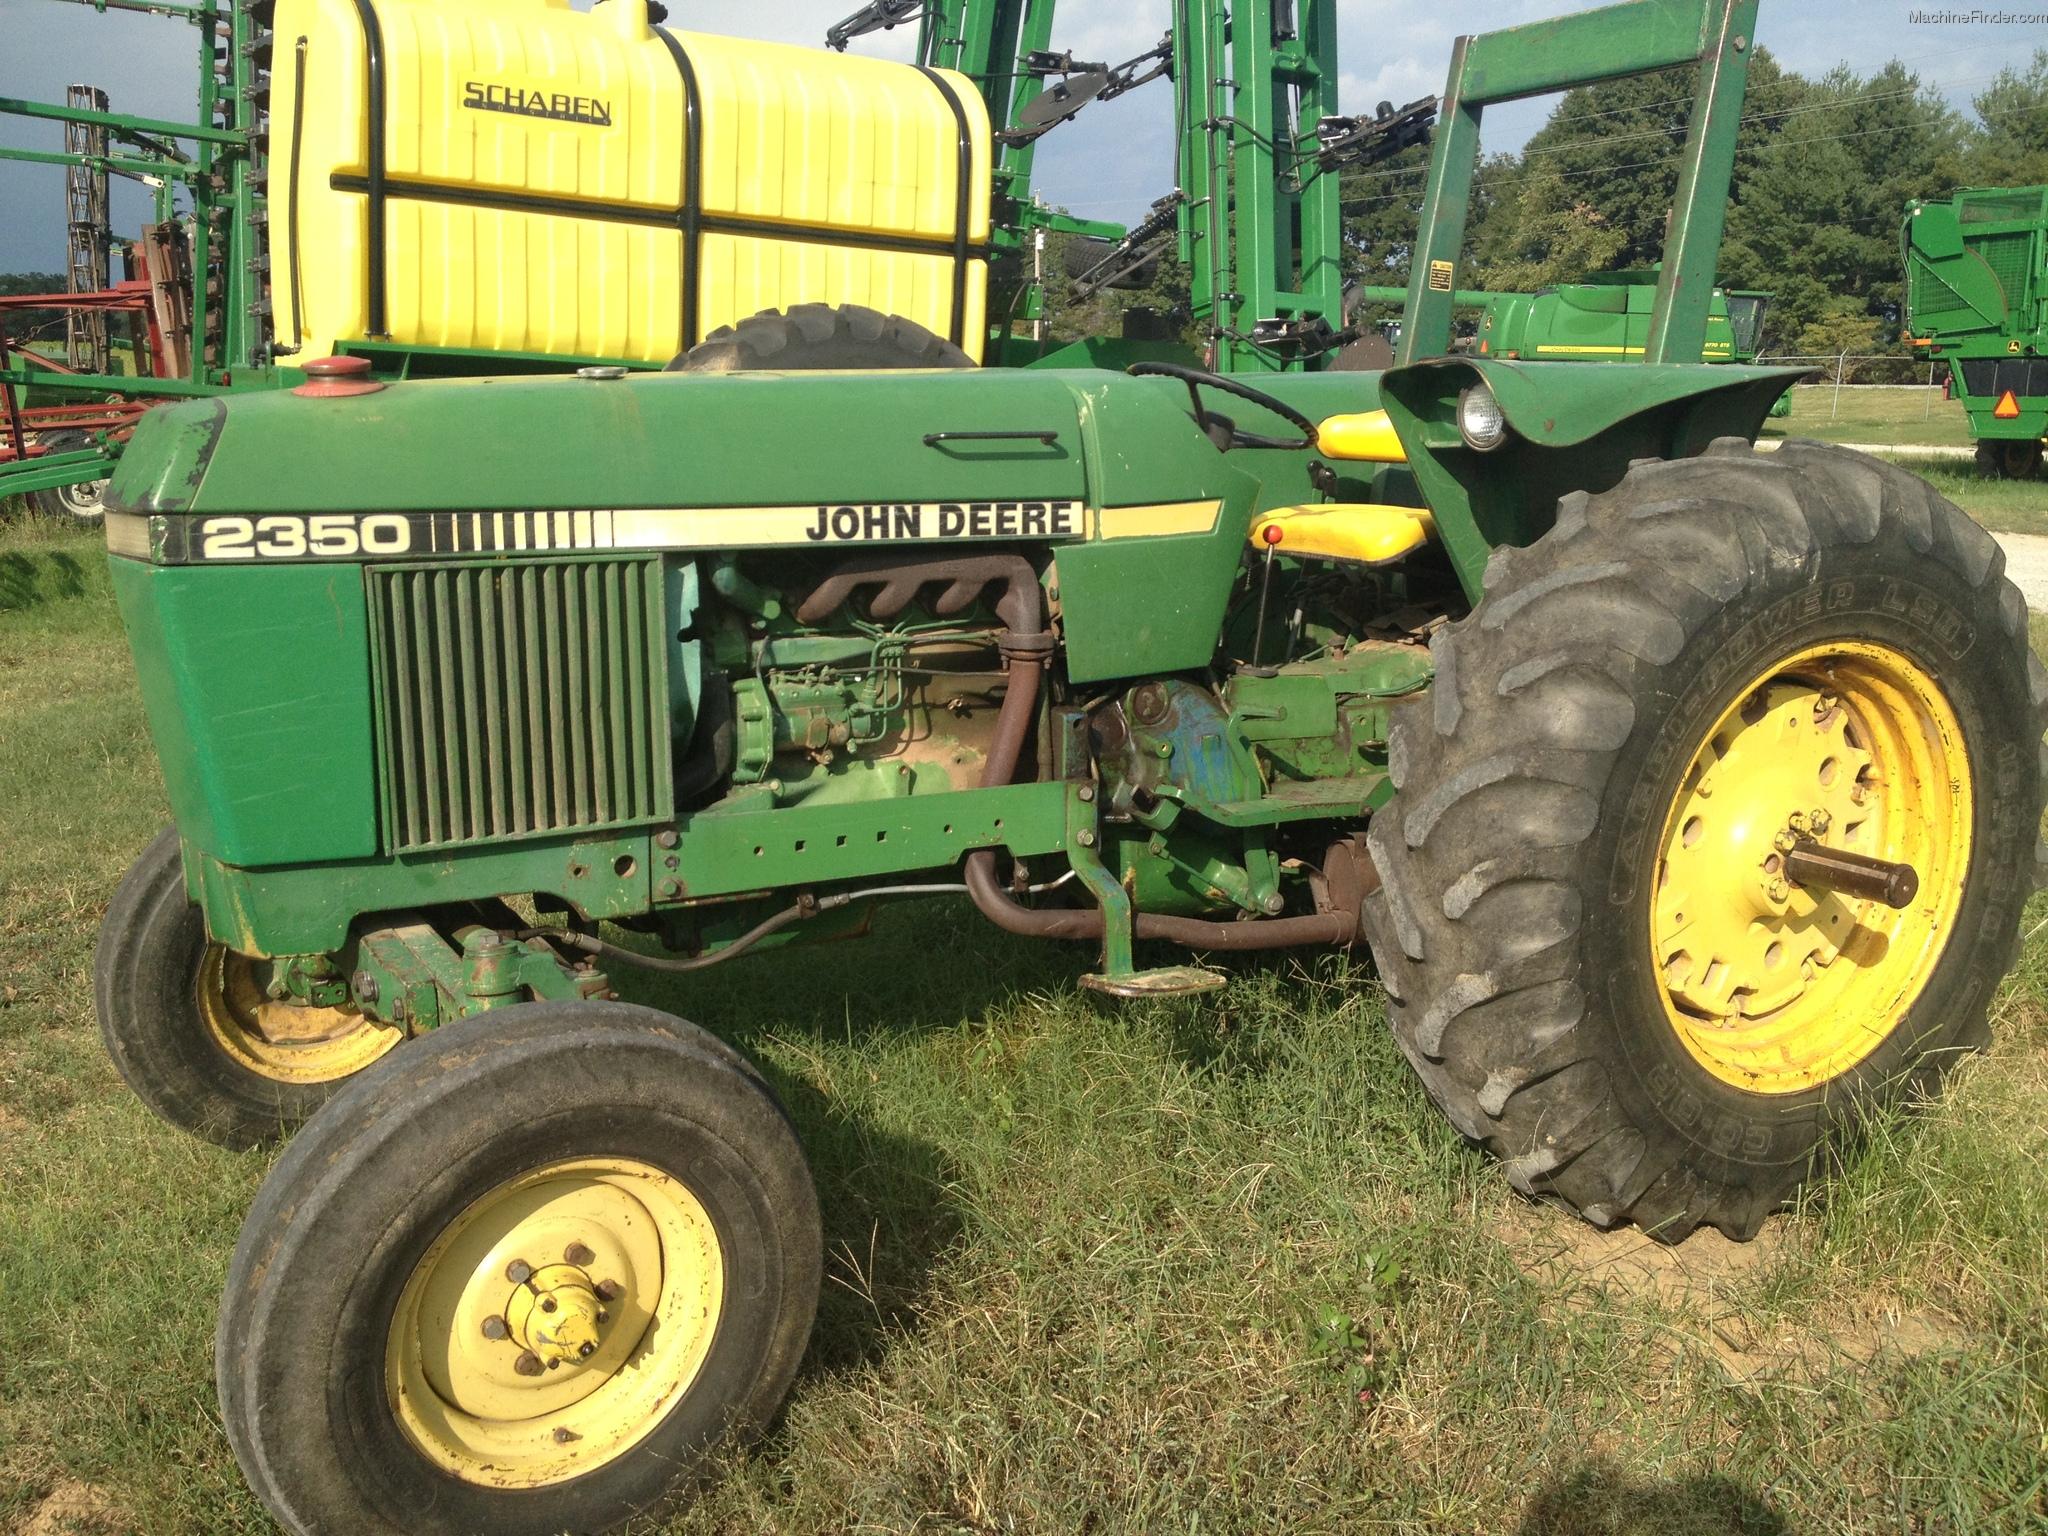 1985 John Deere 2350 Tractors - Utility (40-100hp) - John ...